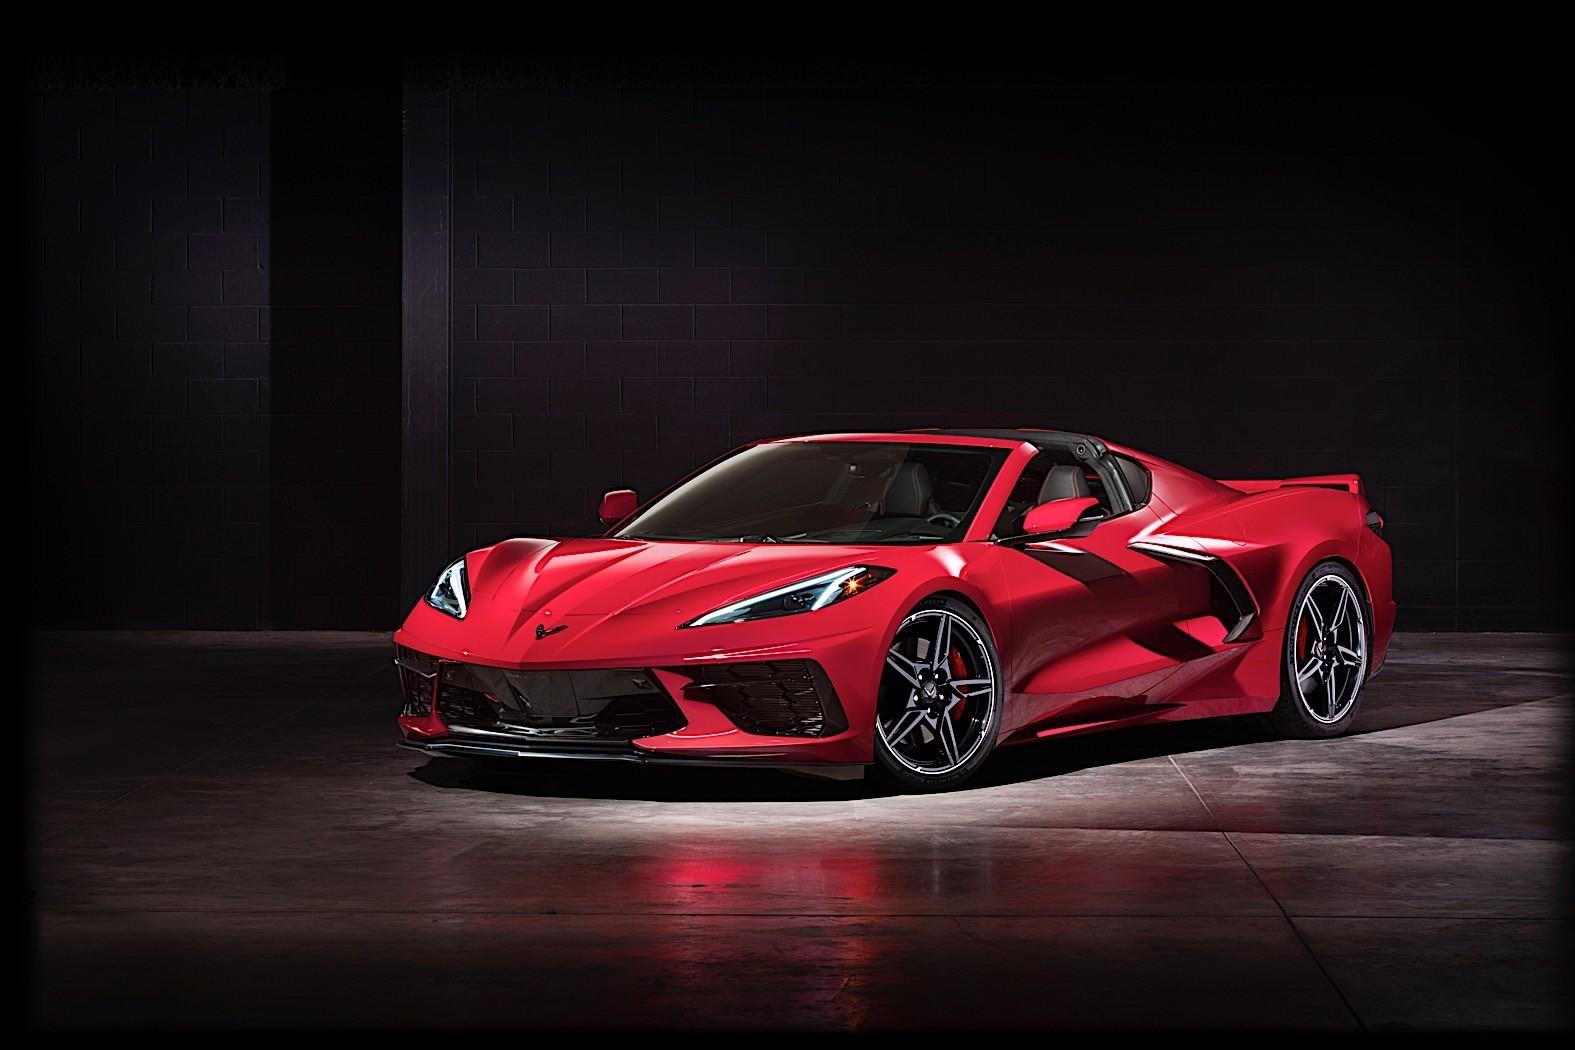 2020 Chevrolet Corvette Stingray Convertible, C8.R To Be ...